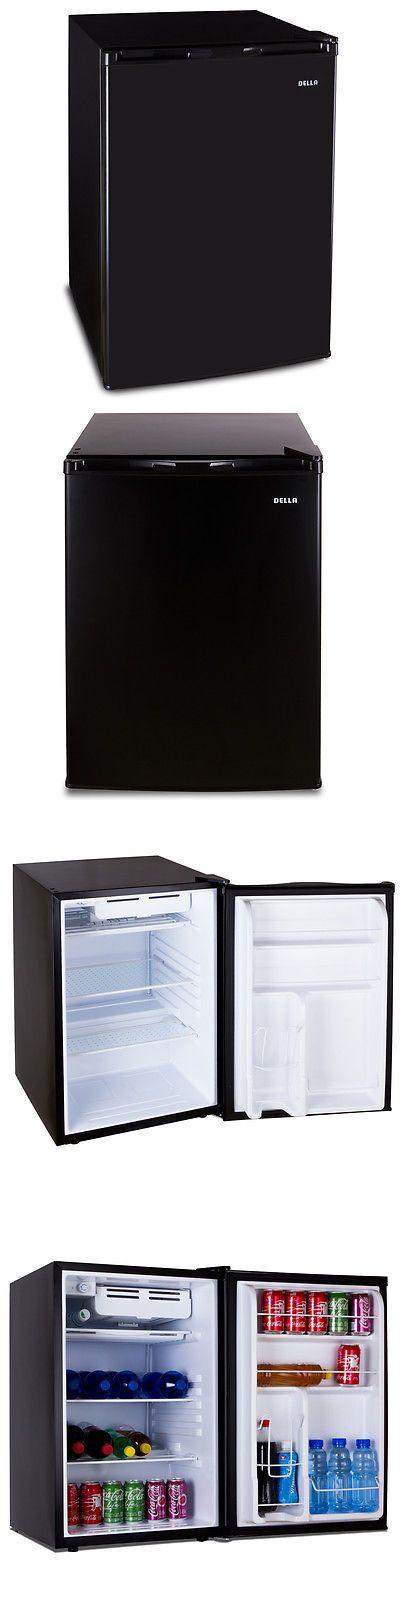 appliances: Mini Small Refrigerator Black Compact Fridge Freezer Dorm Cooler 4.5 Cu. Ft. -> BUY IT NOW ONLY: $109.97 on eBay!